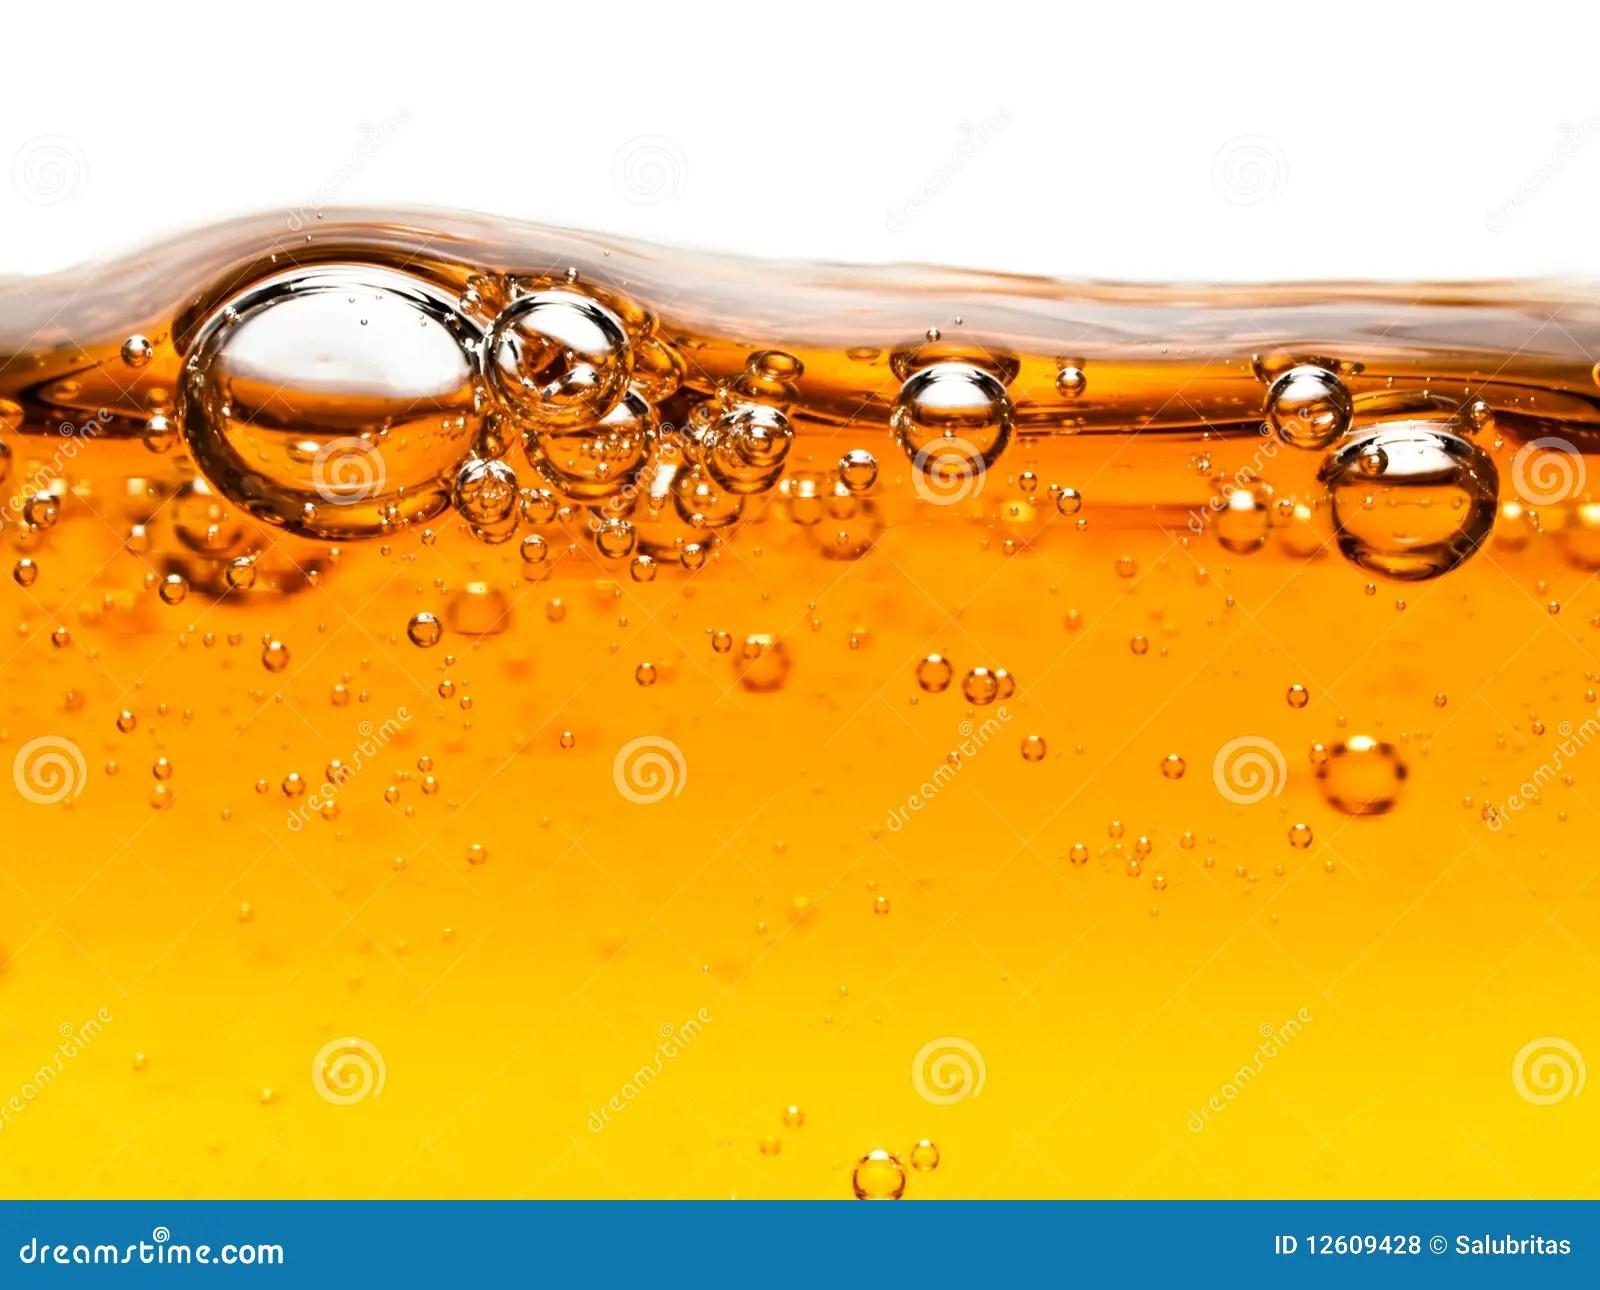 Bubbles In Orange Liquid Soap Royalty Free Stock Photos  Image 12609428